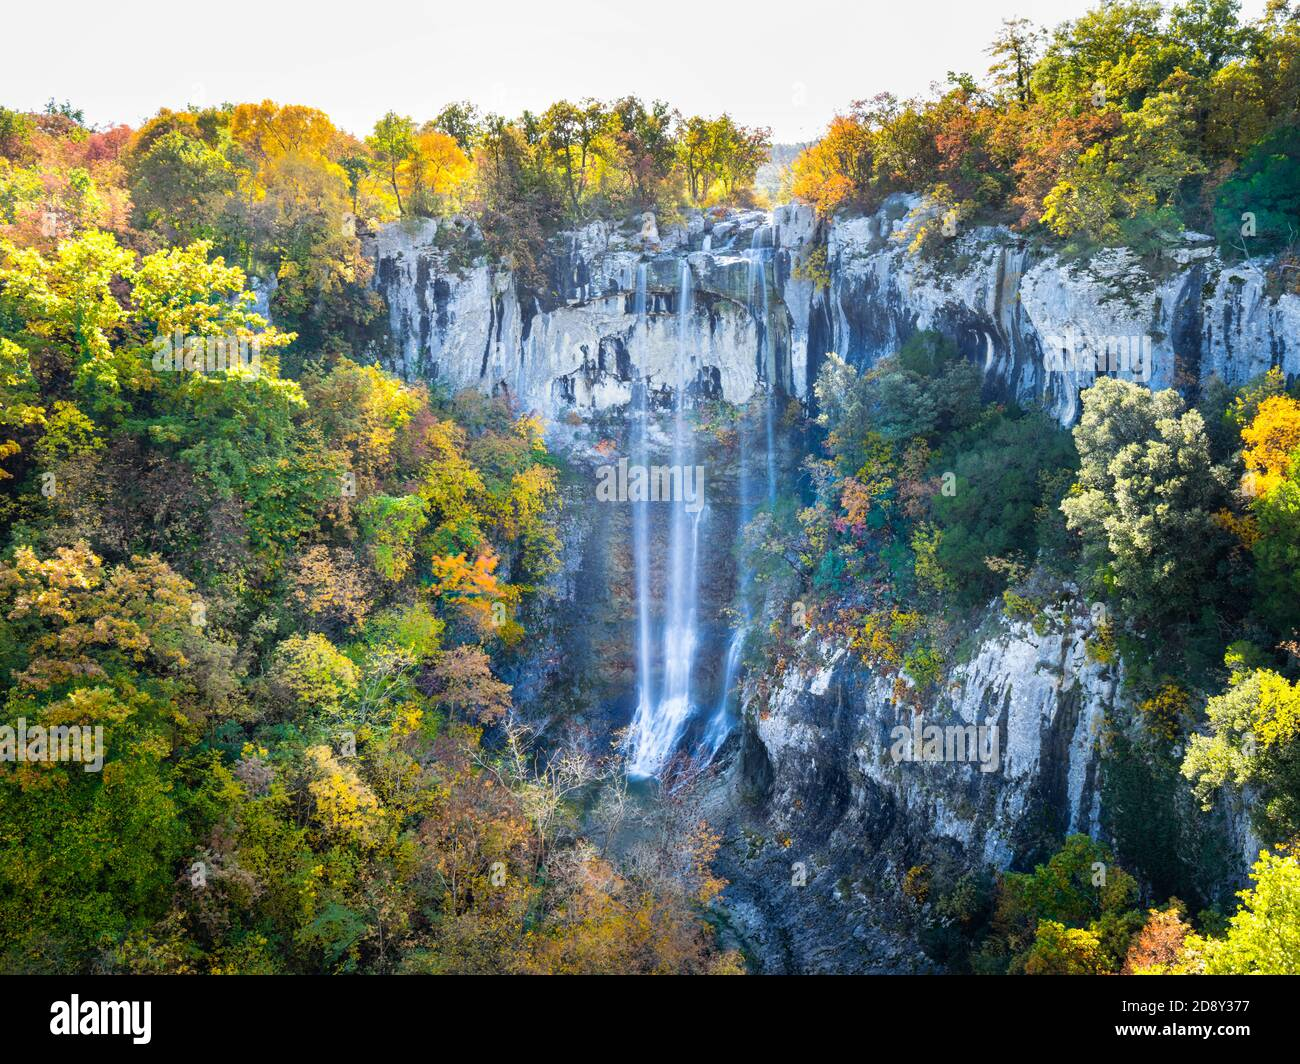 Benkovski slap waterfall canyon near Pican in Croatia Europe steep deep stone relief Autumnvibes Autumnvibe Autumnal Stock Photo